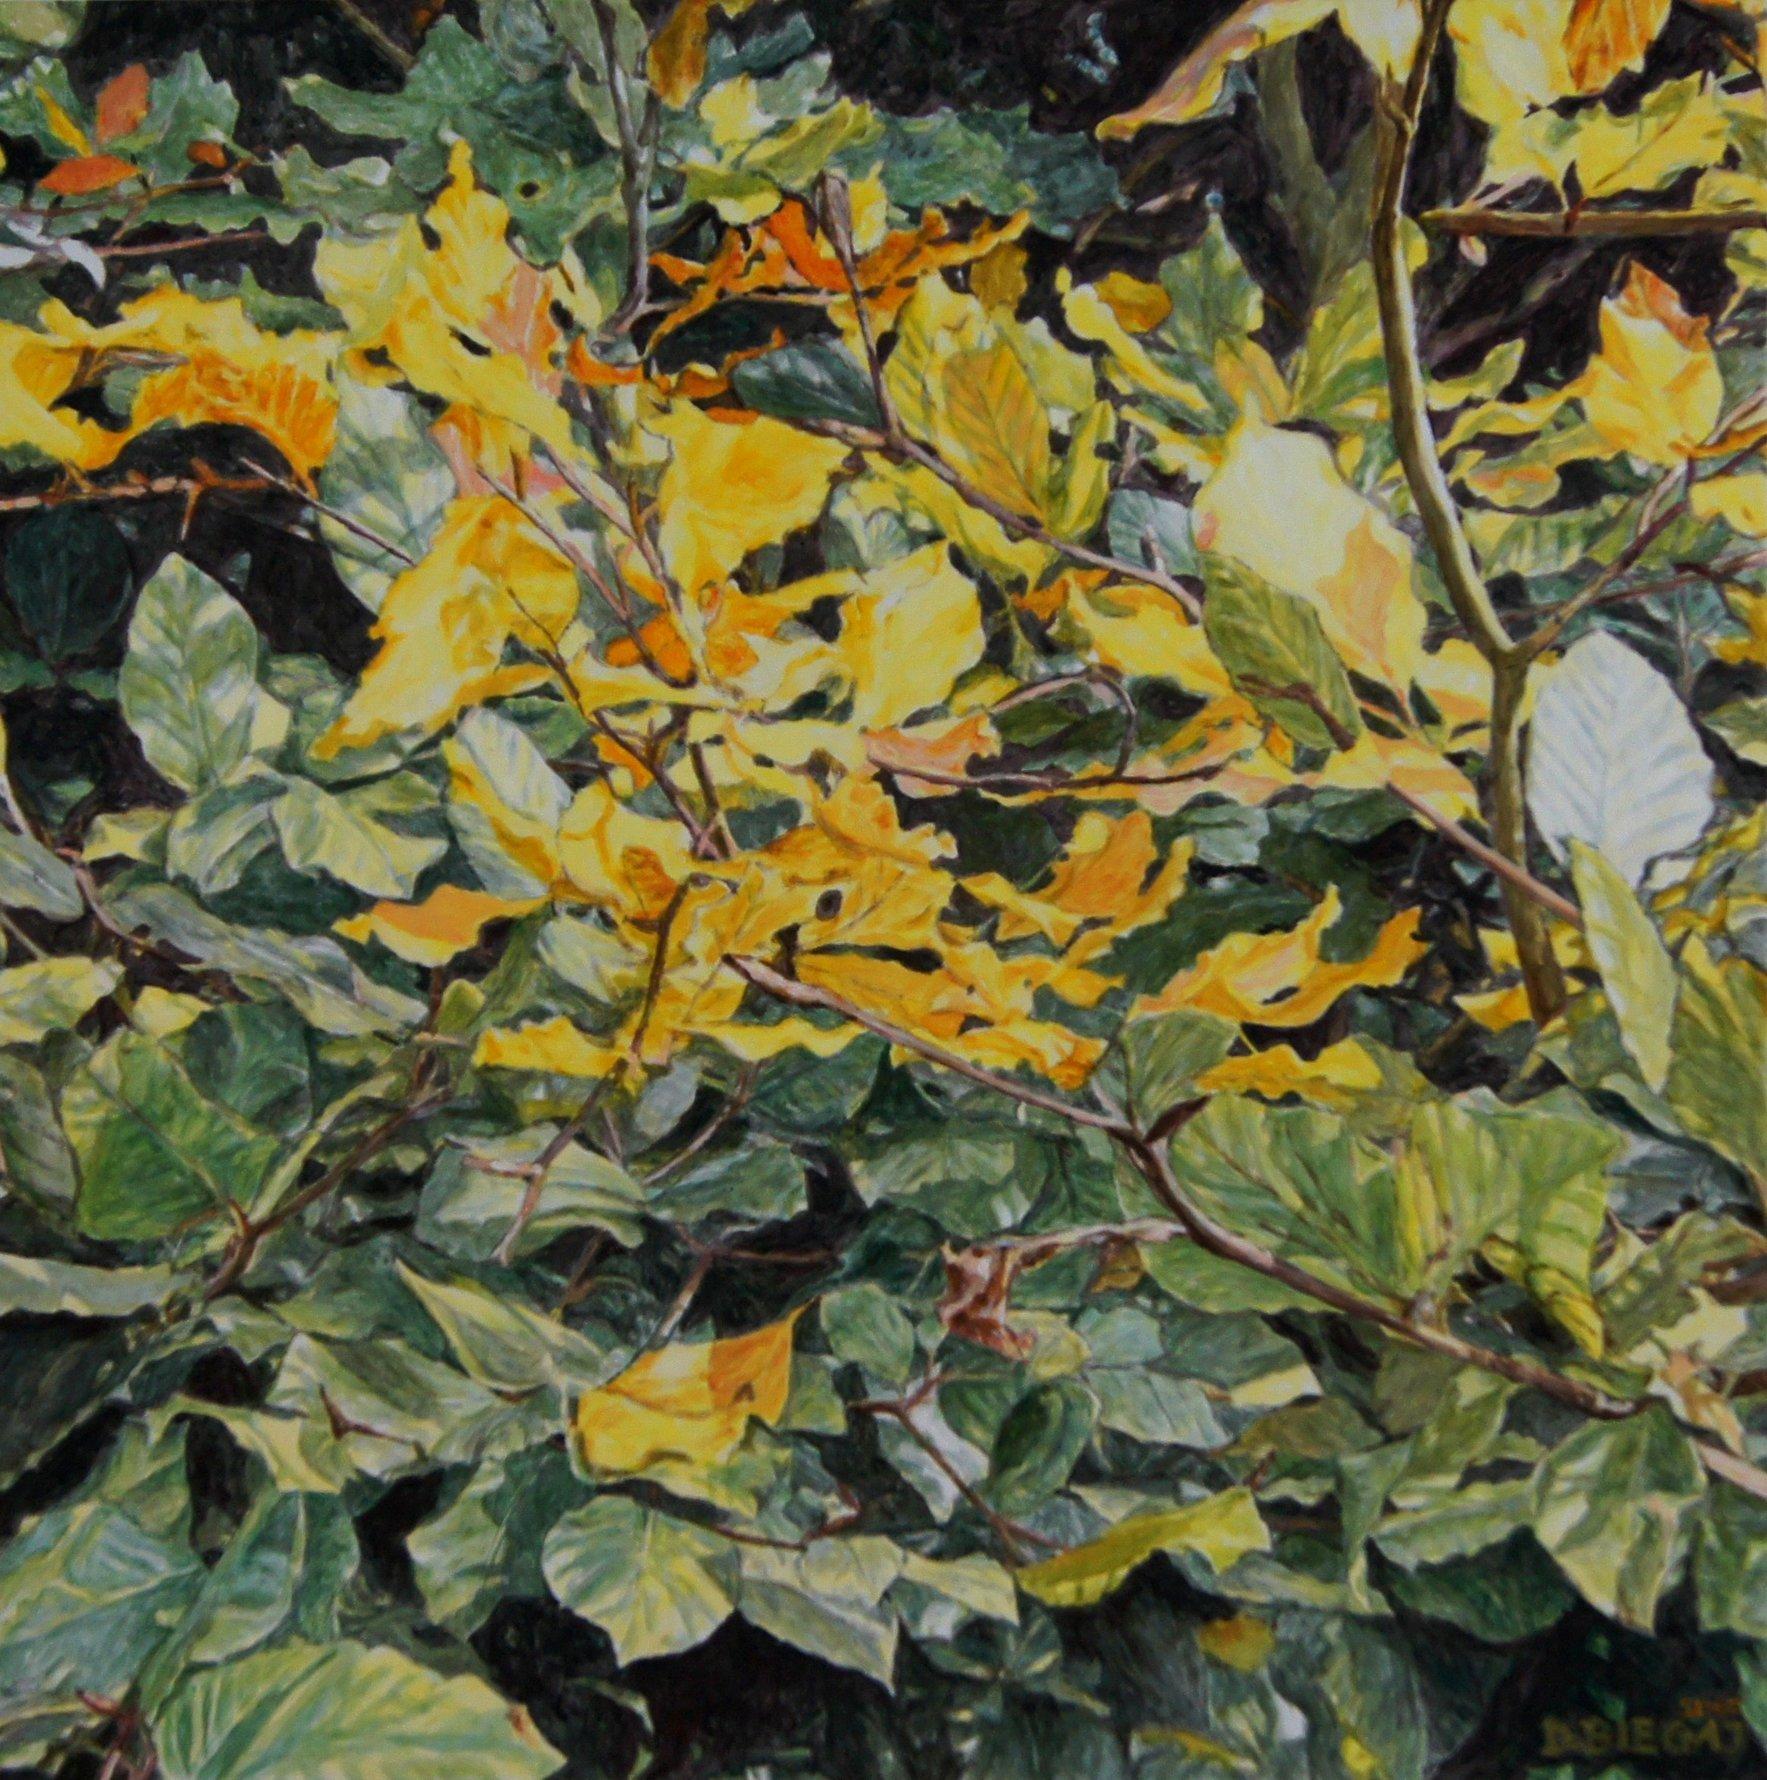 Nature 6 90x90 akryl płótno 2015